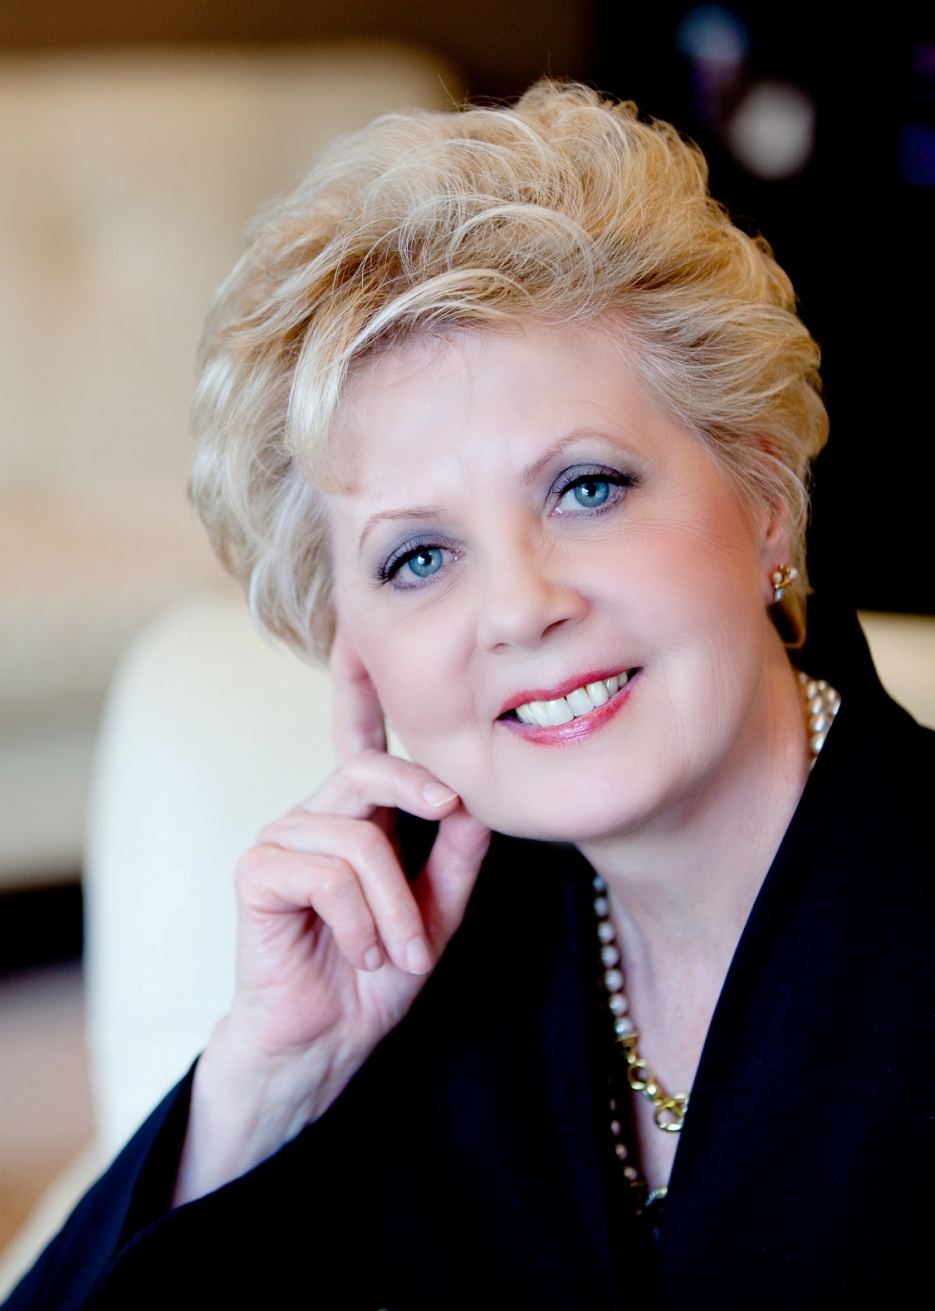 Renowned plastic surgeon Dr. Paula Moynahan